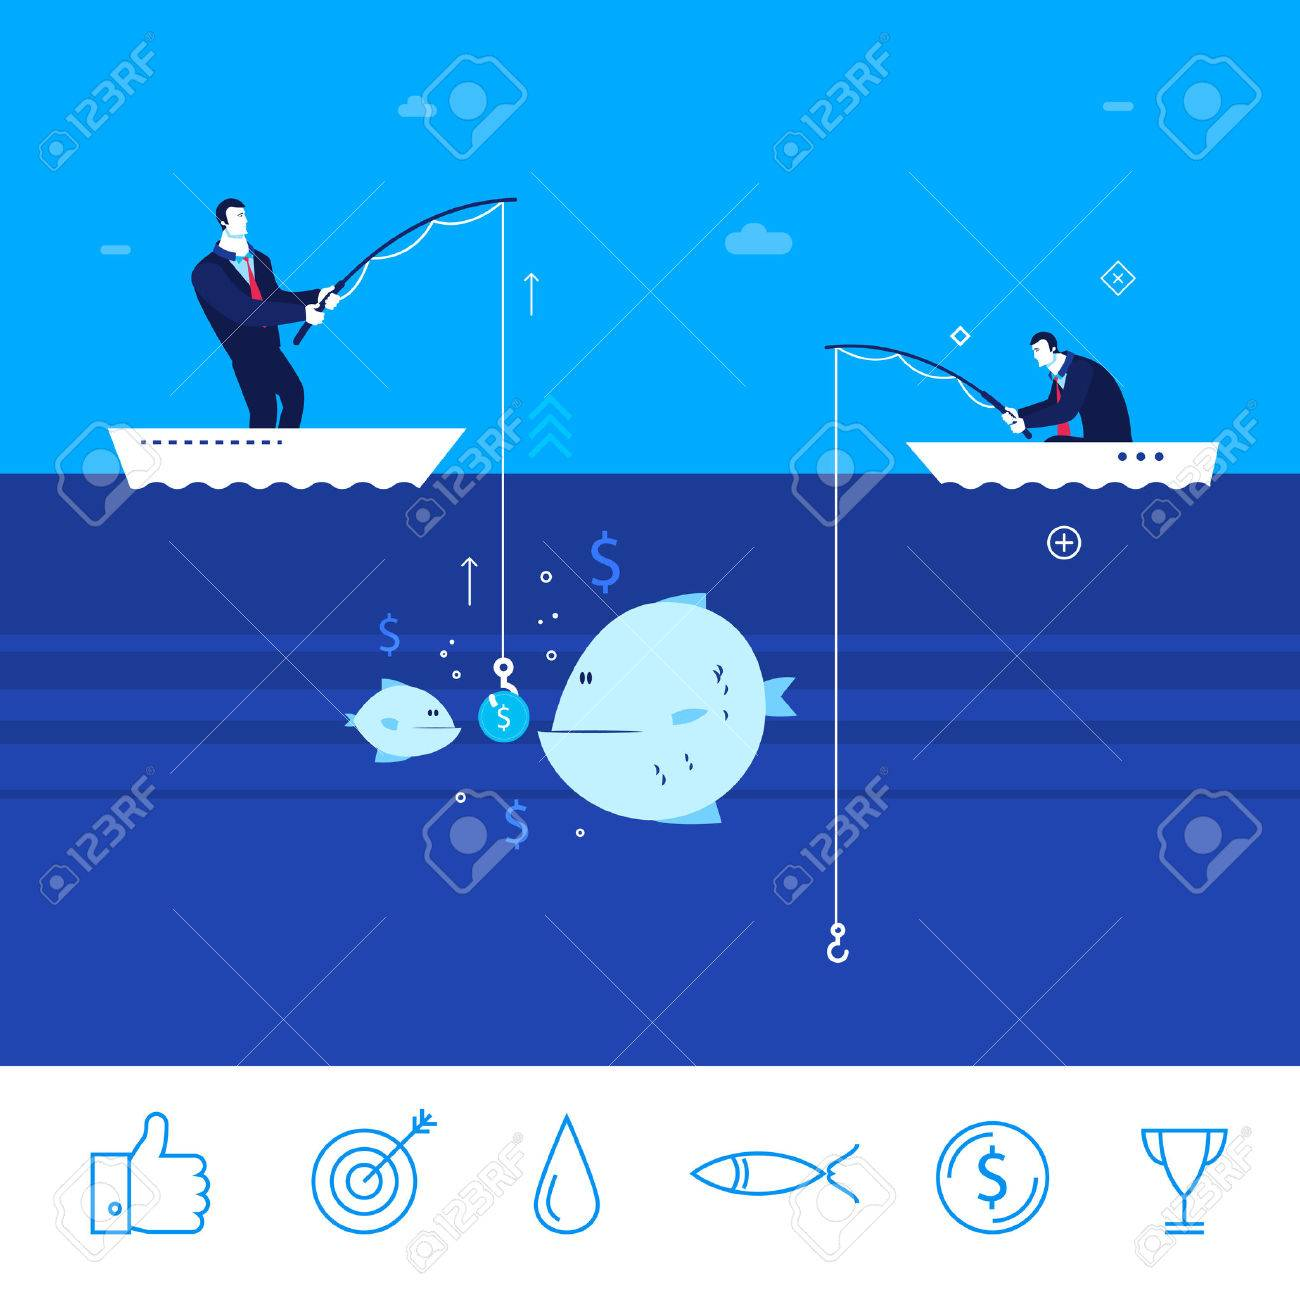 Flat design concept illustration. Two businessman on fishing. good production. Good profit. Unsuccessful catch. clipart. Icons set. - 54303016